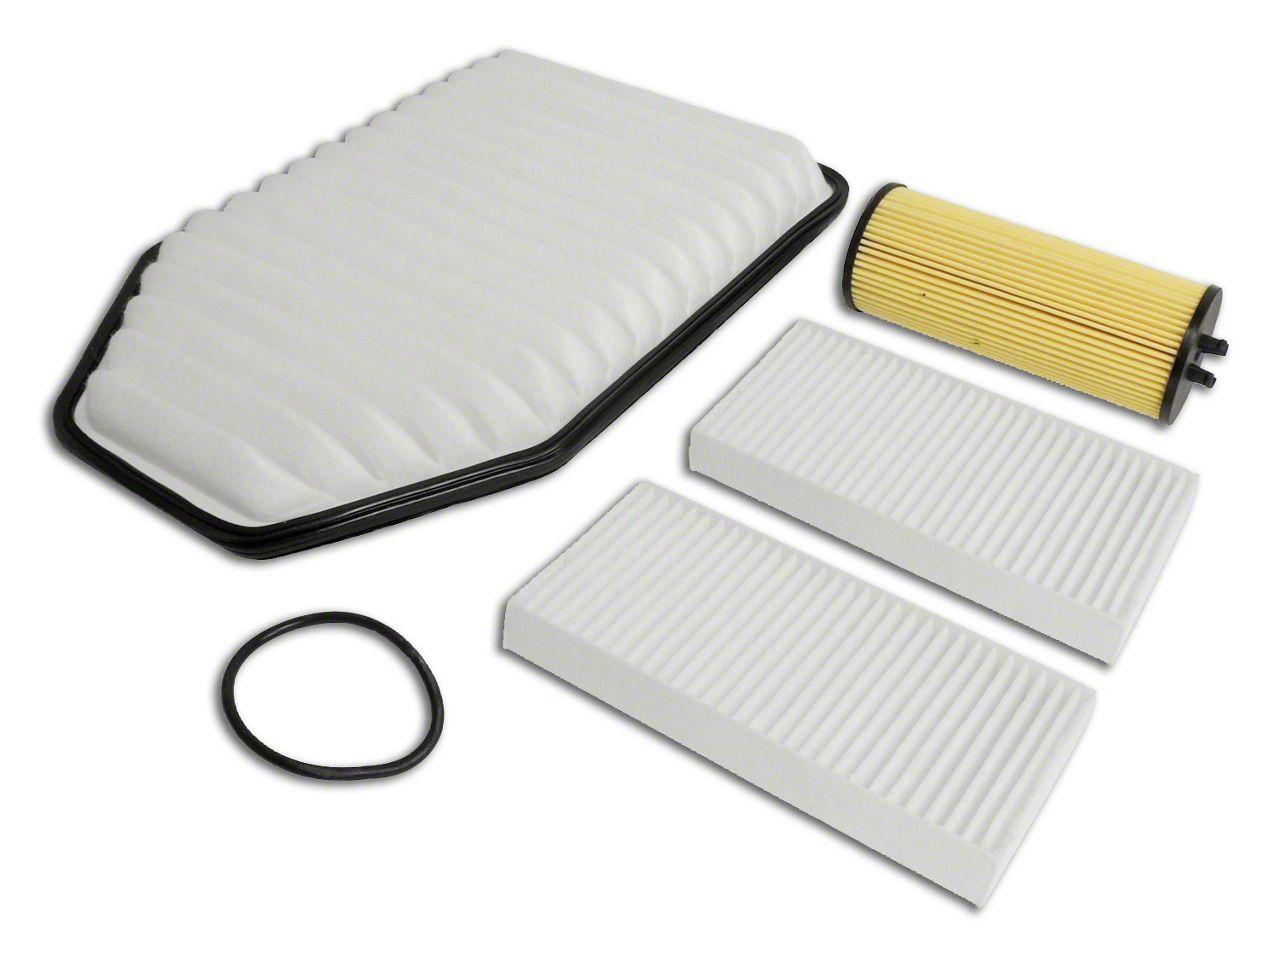 Omix-ADA Master Filter Kit (12-13 3.6L Jeep Wrangler JK)